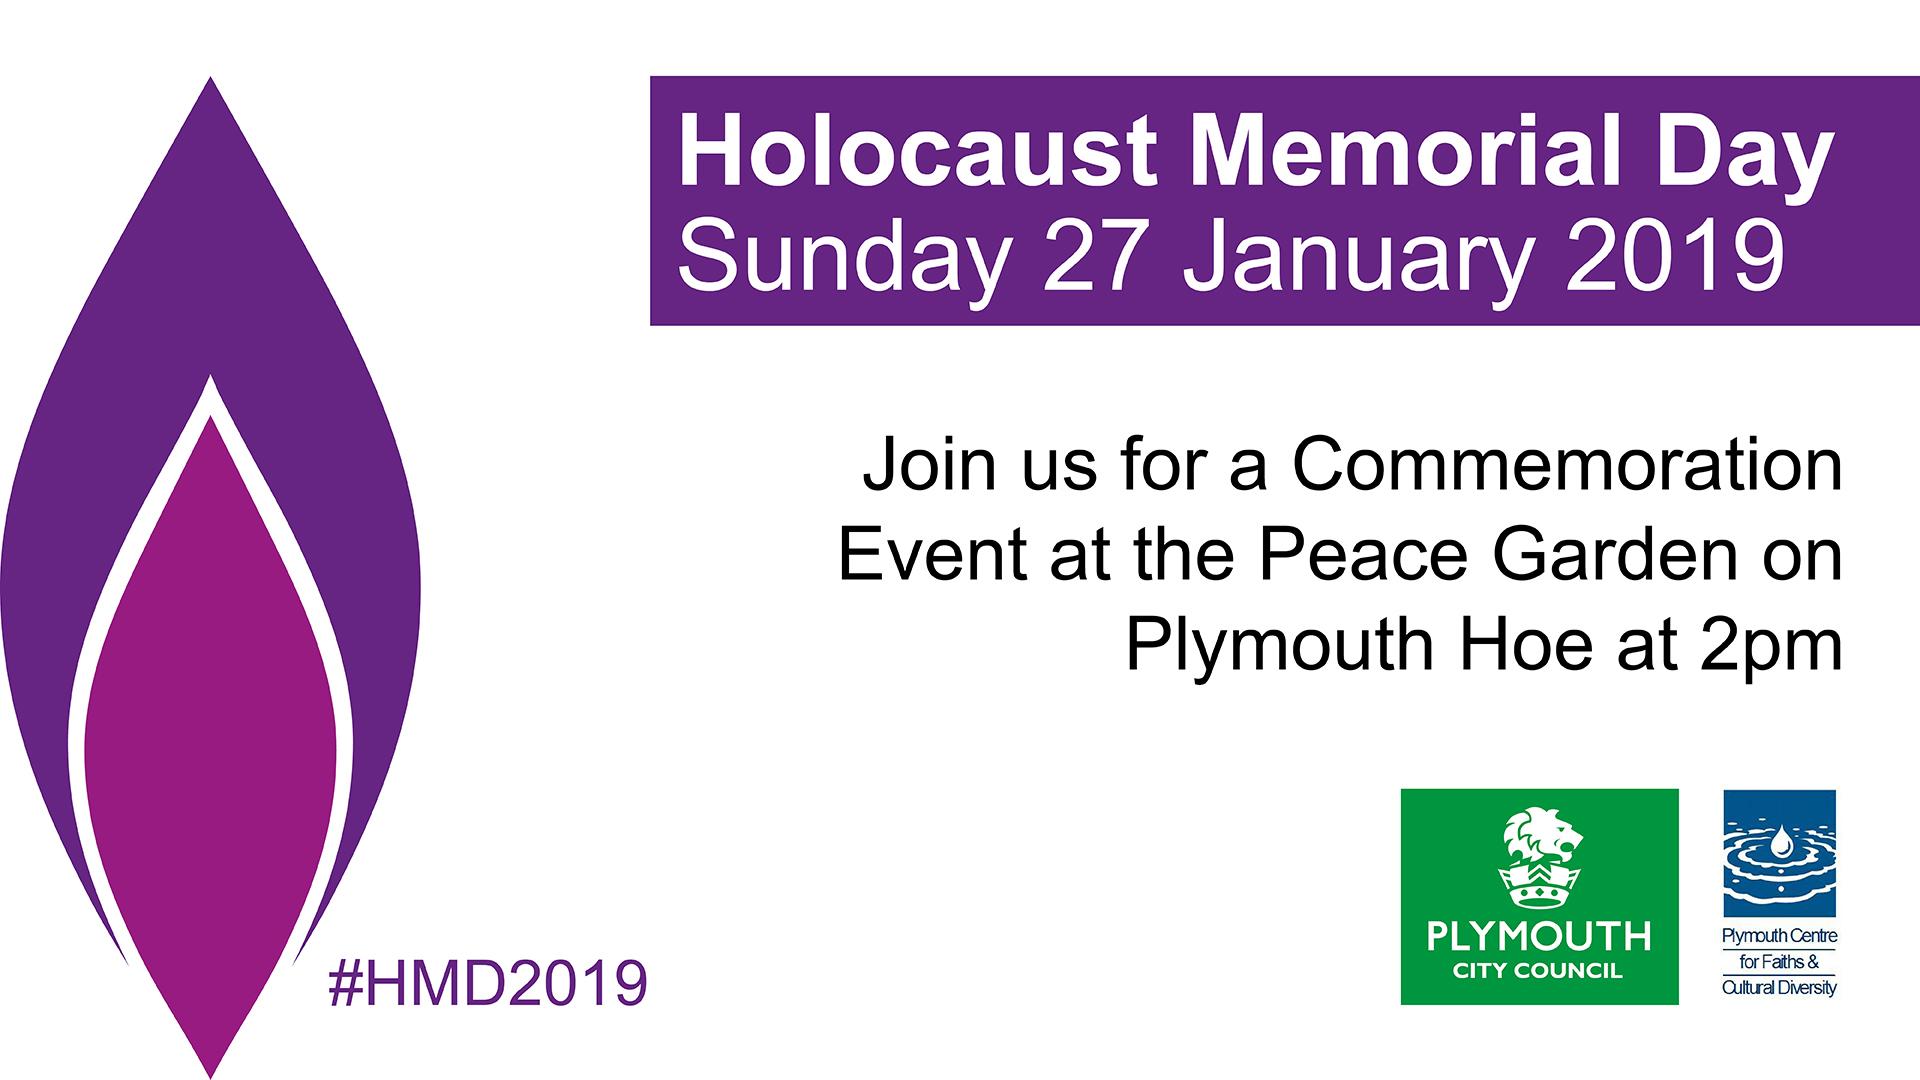 Commemoration event